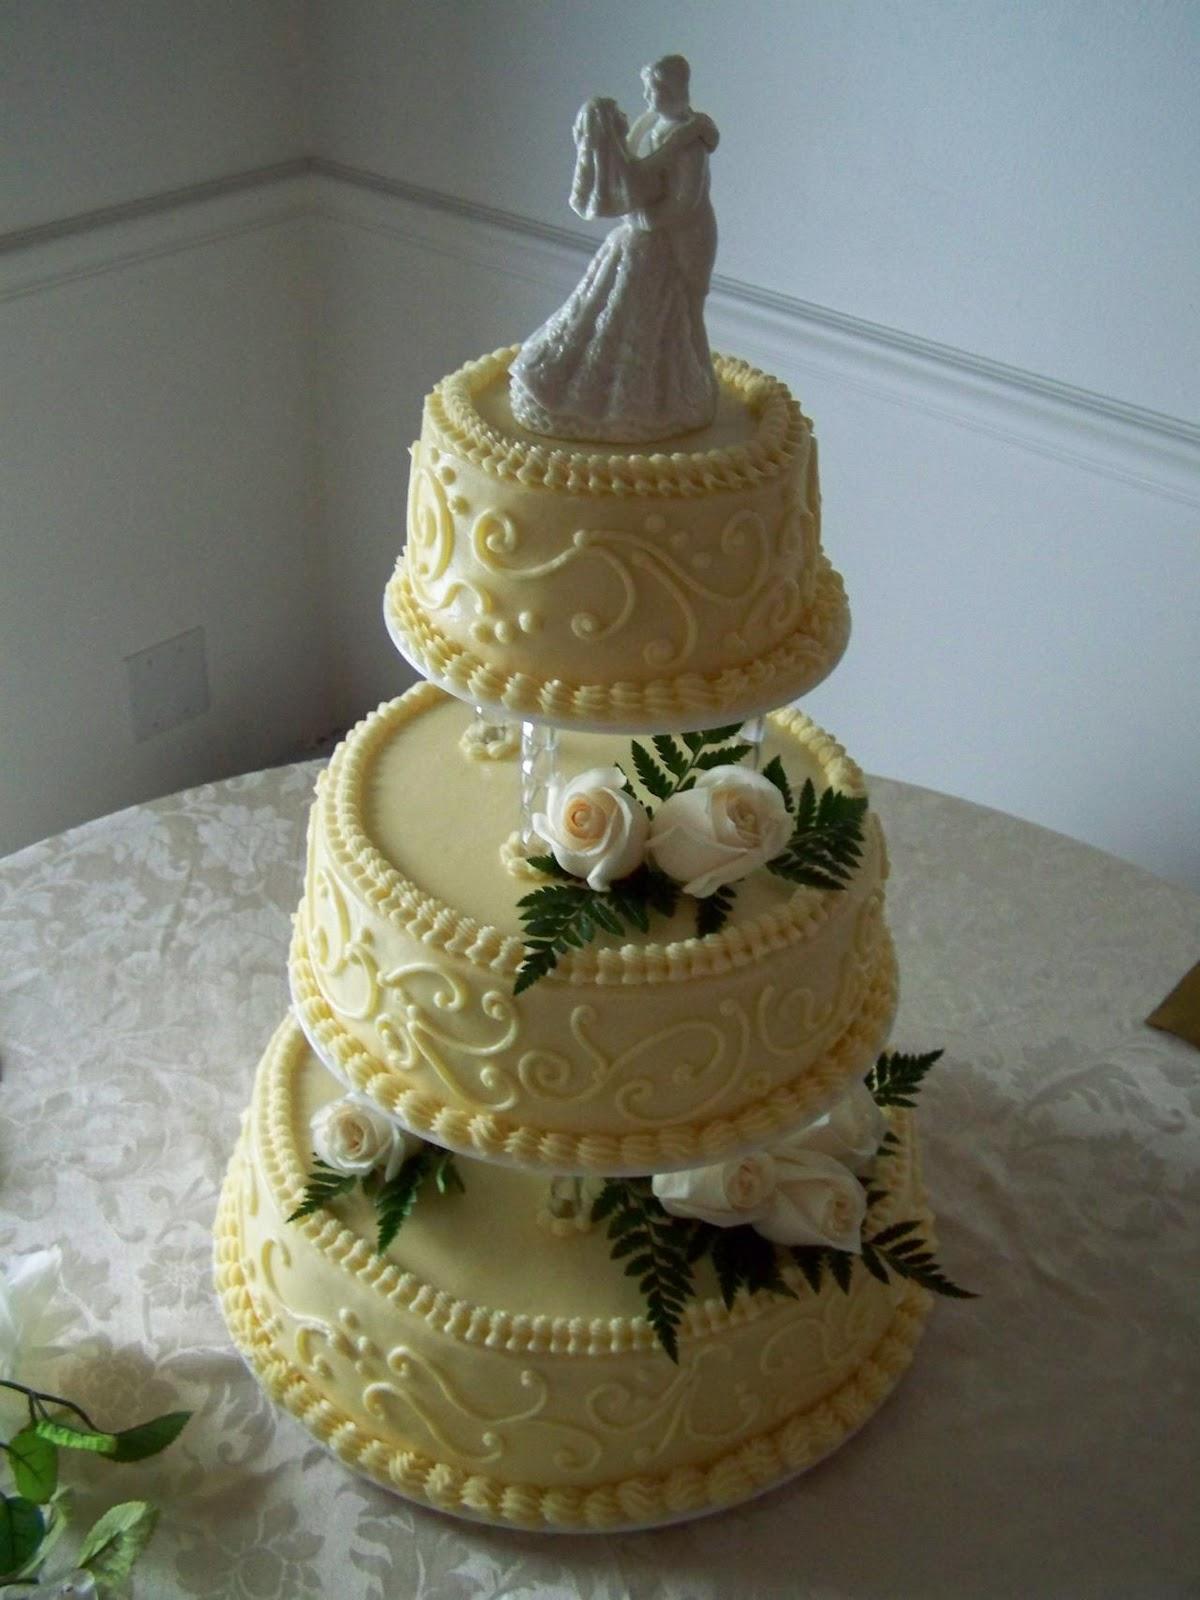 Inc. - Wedding Cakes Click